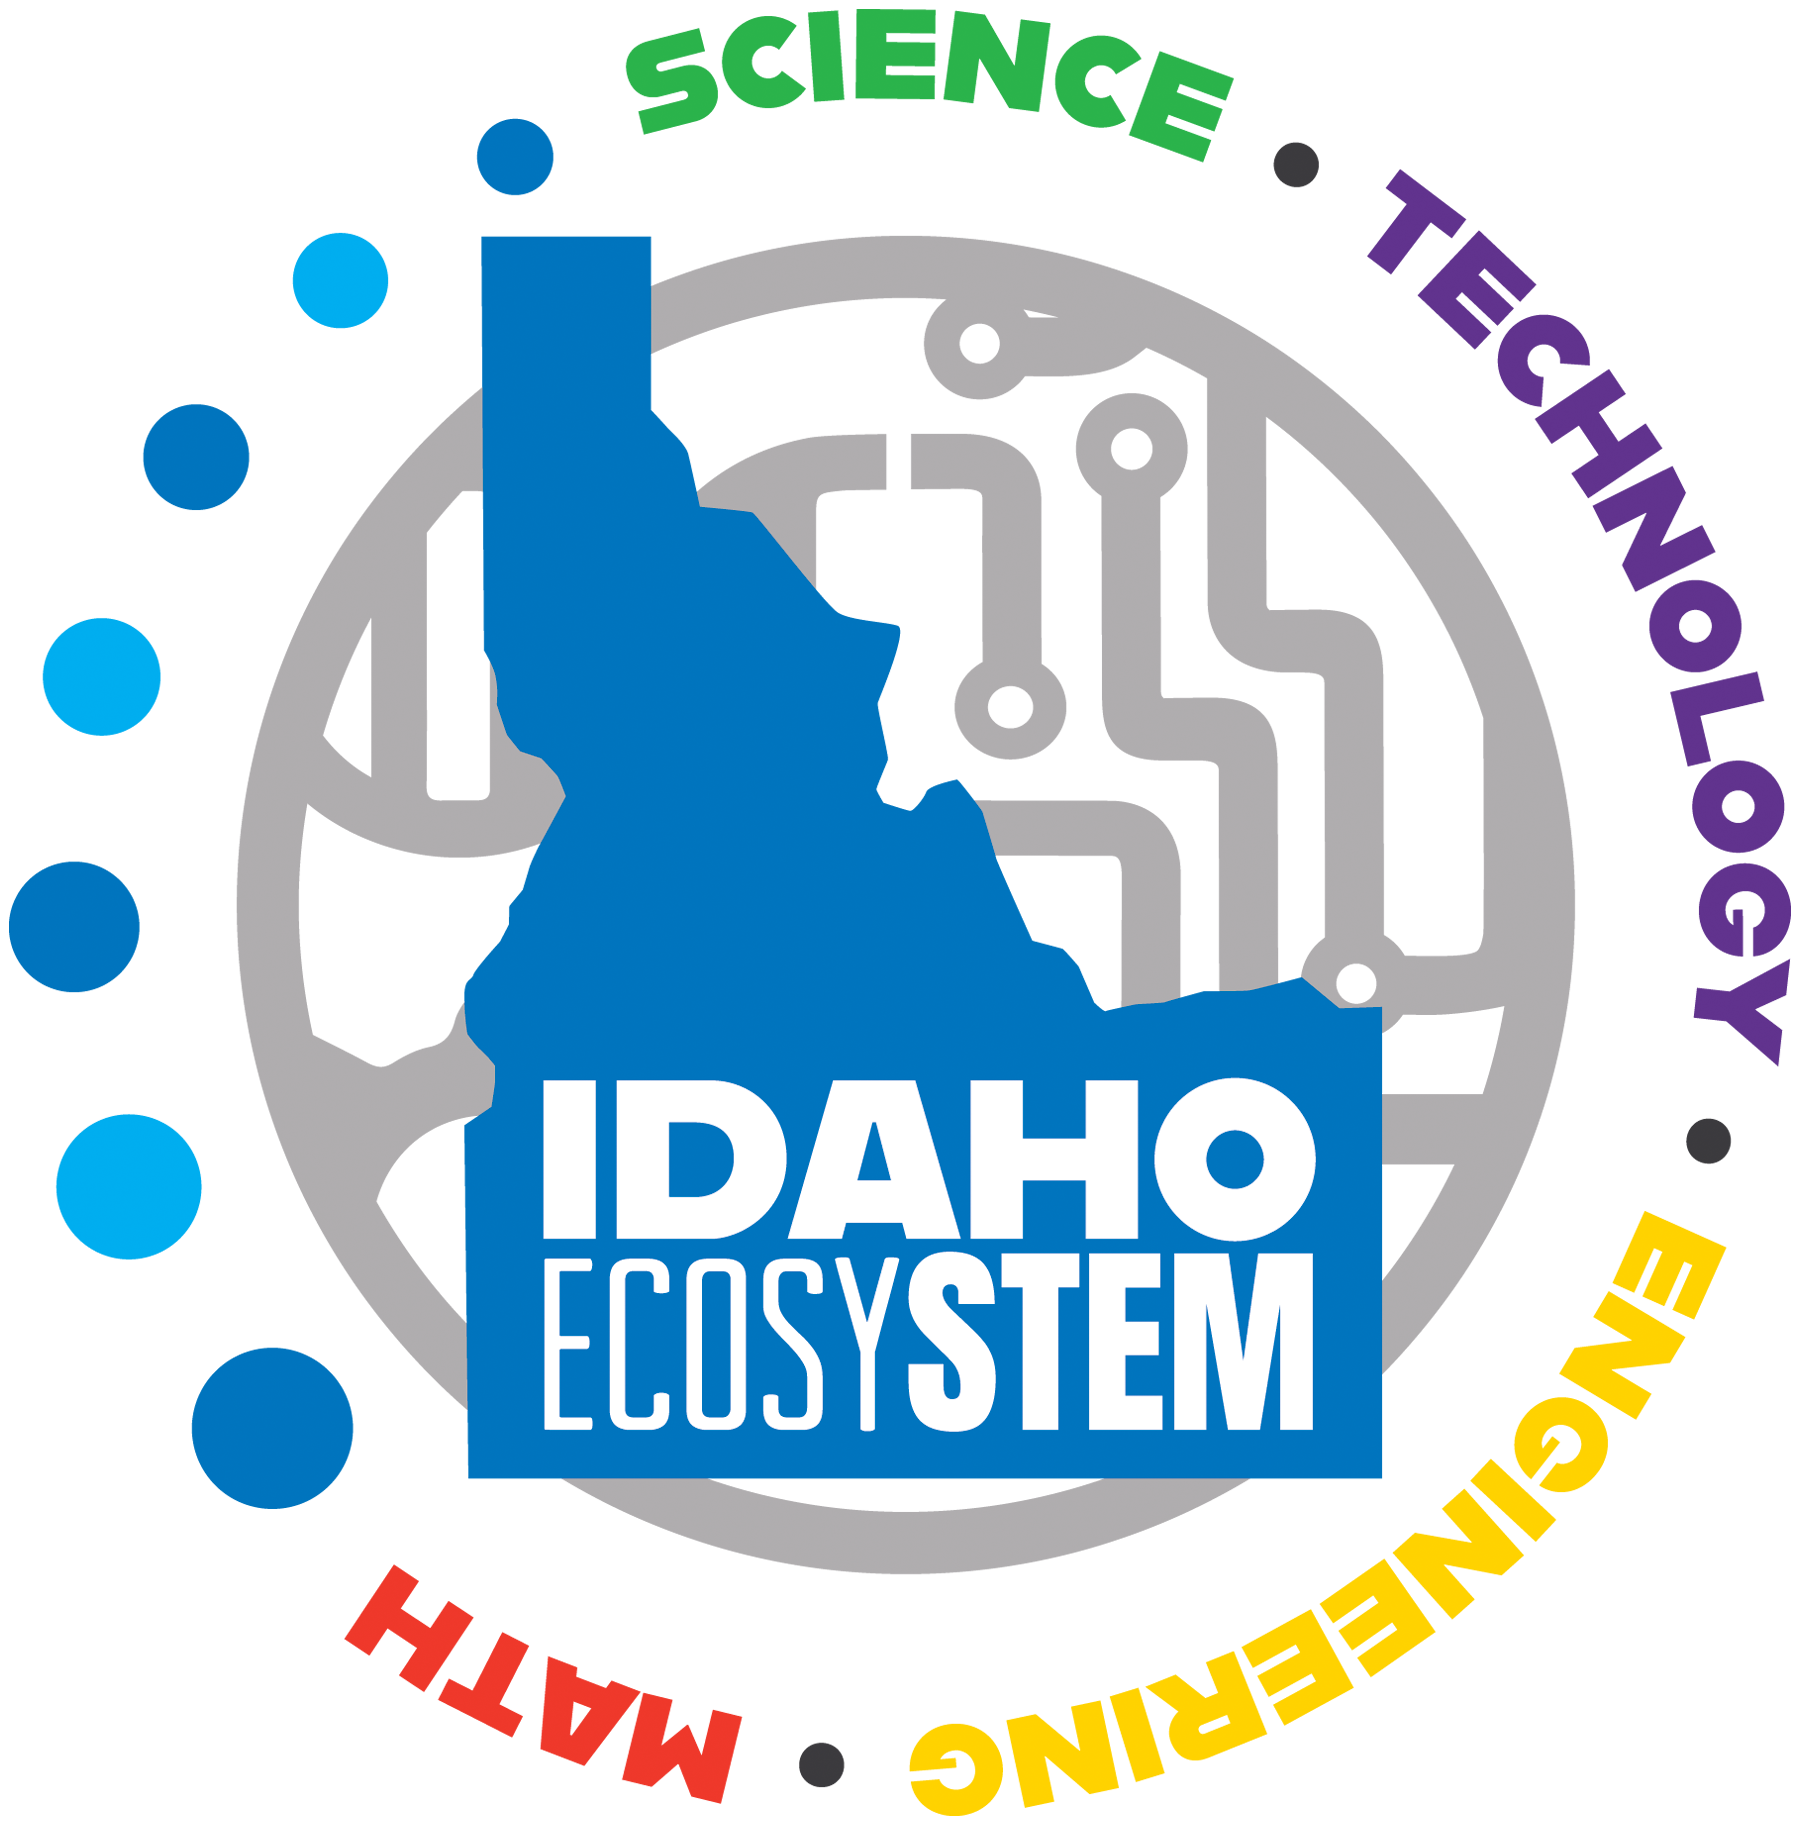 IDAHO ECOSYSTEM Logo